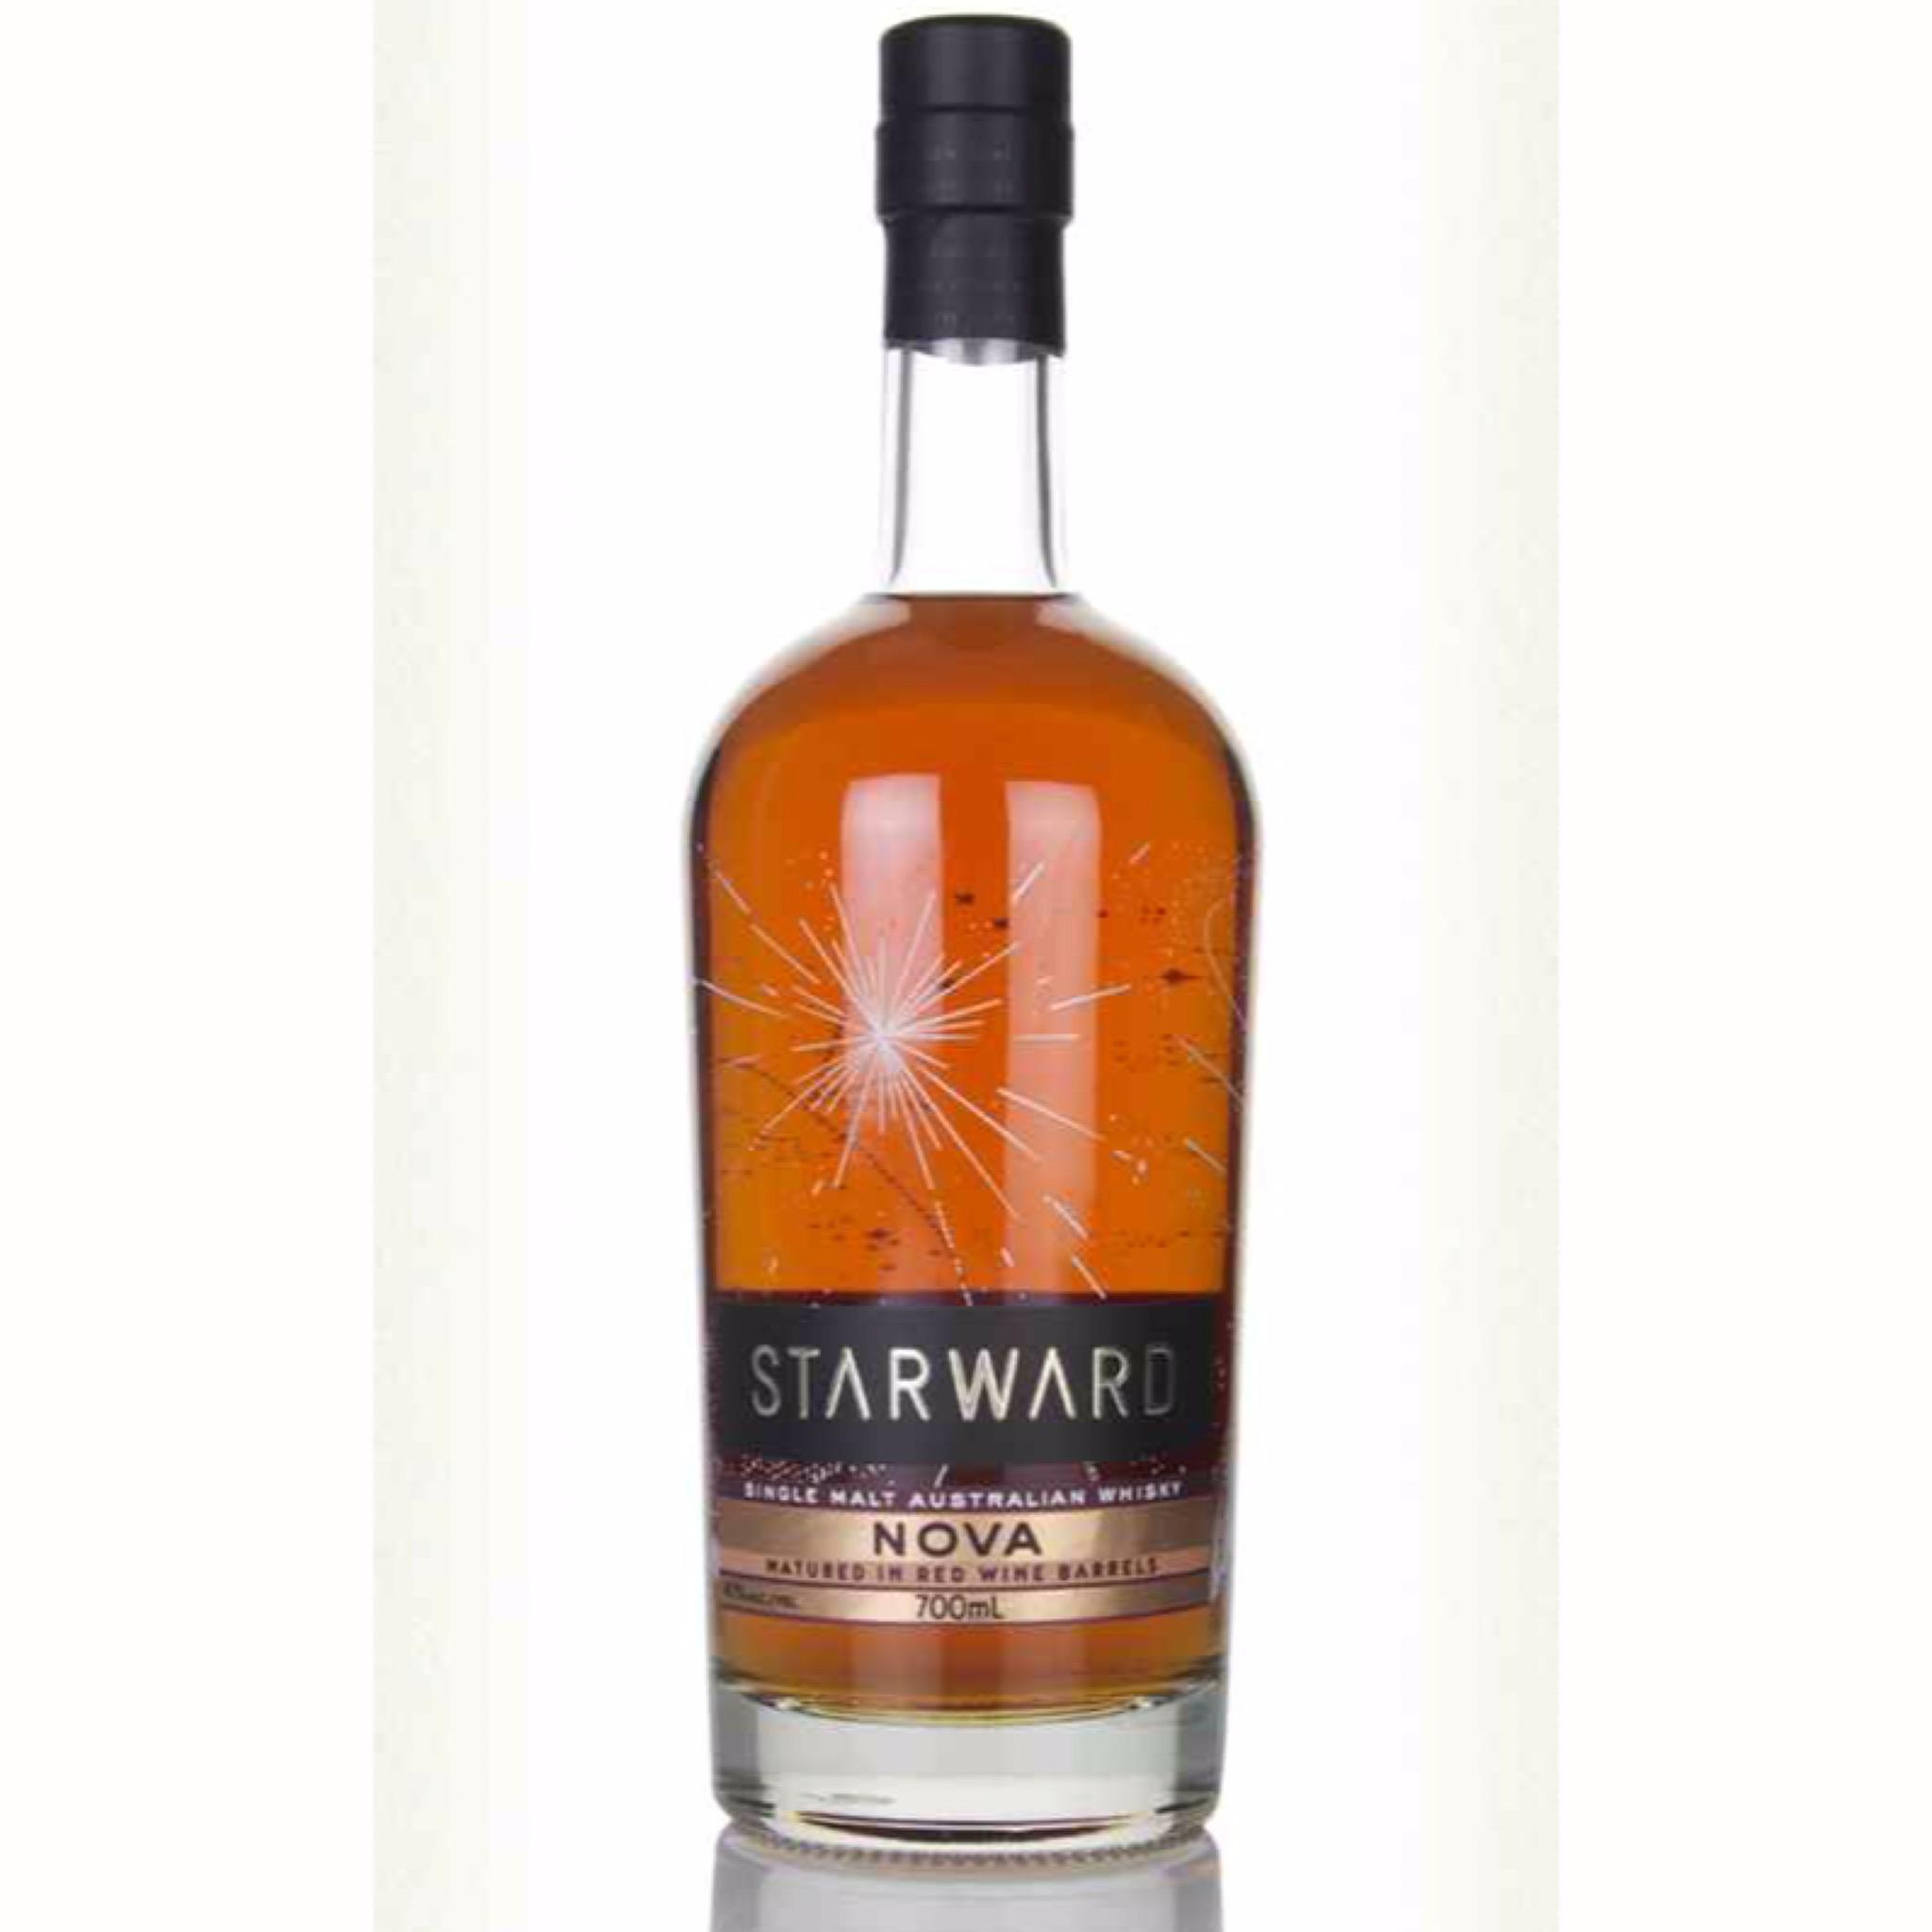 Starward Nova Single Malt Australian Whisky 41% 700ml